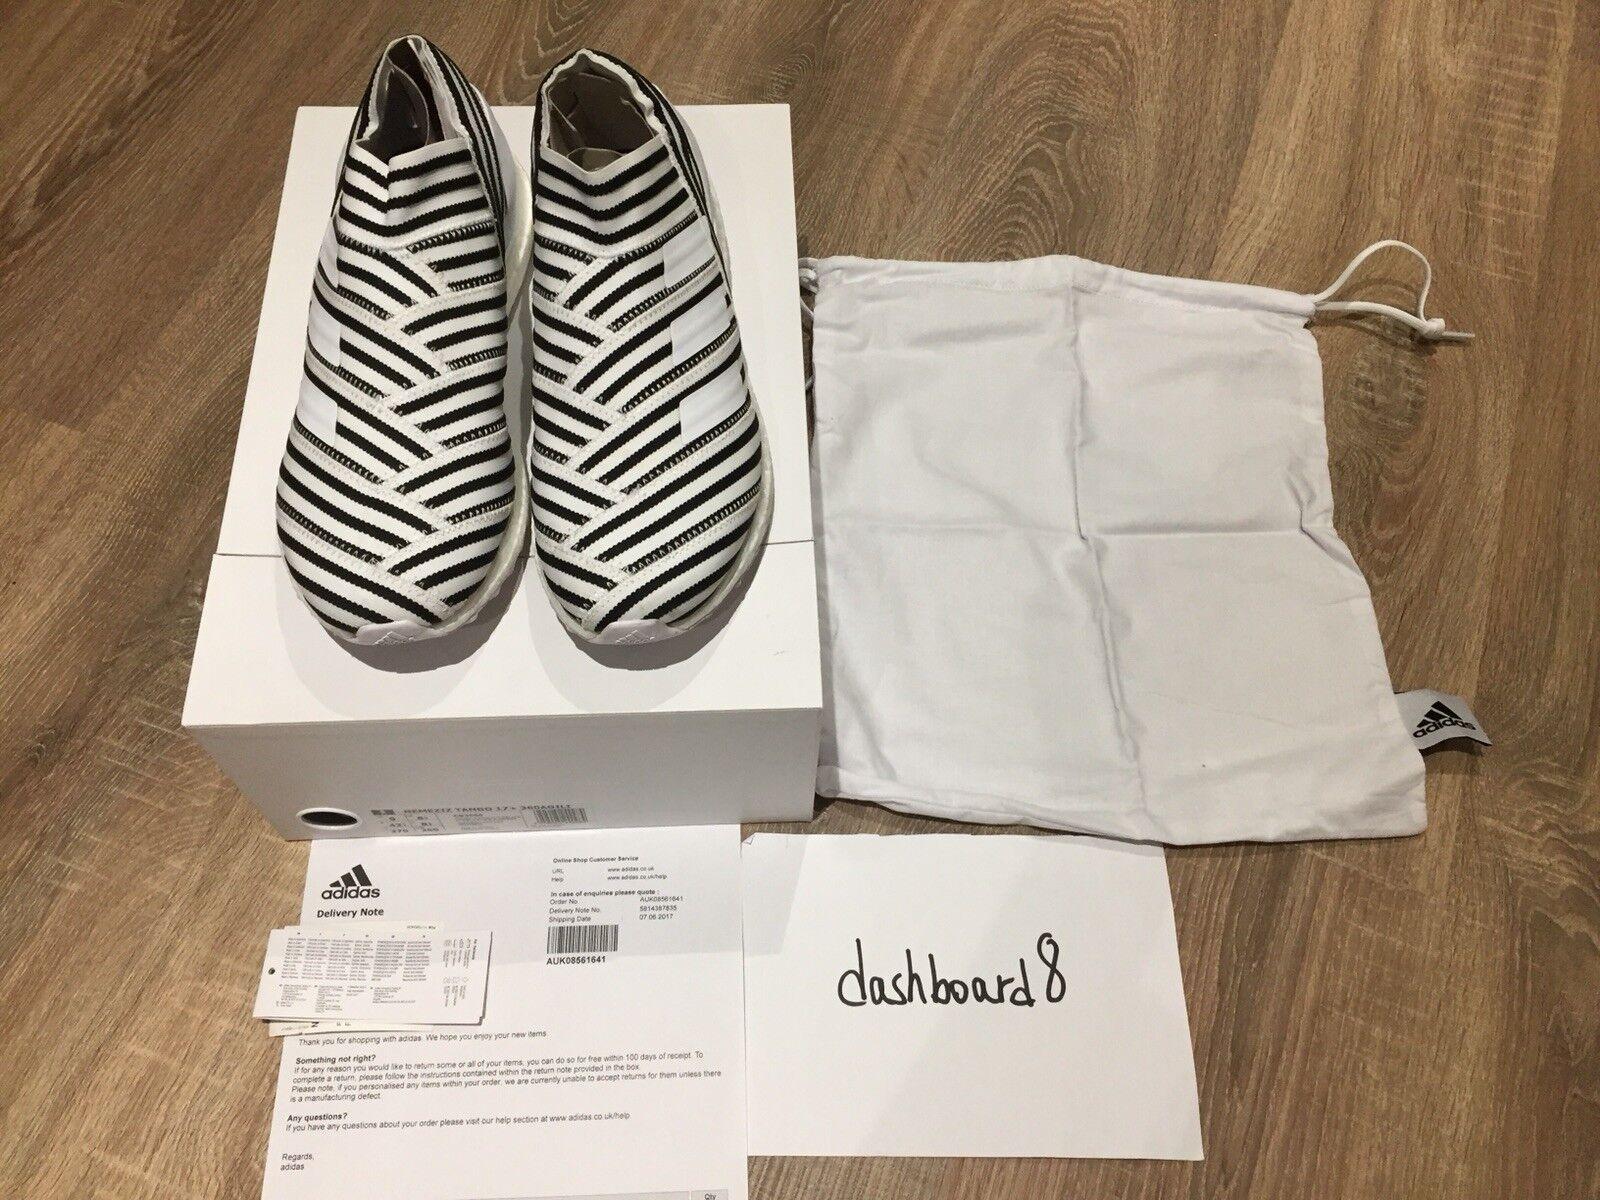 Adidas NEMEZIZ TANGO 17+ 360 AGILI UK8.5 Occasion 9 10